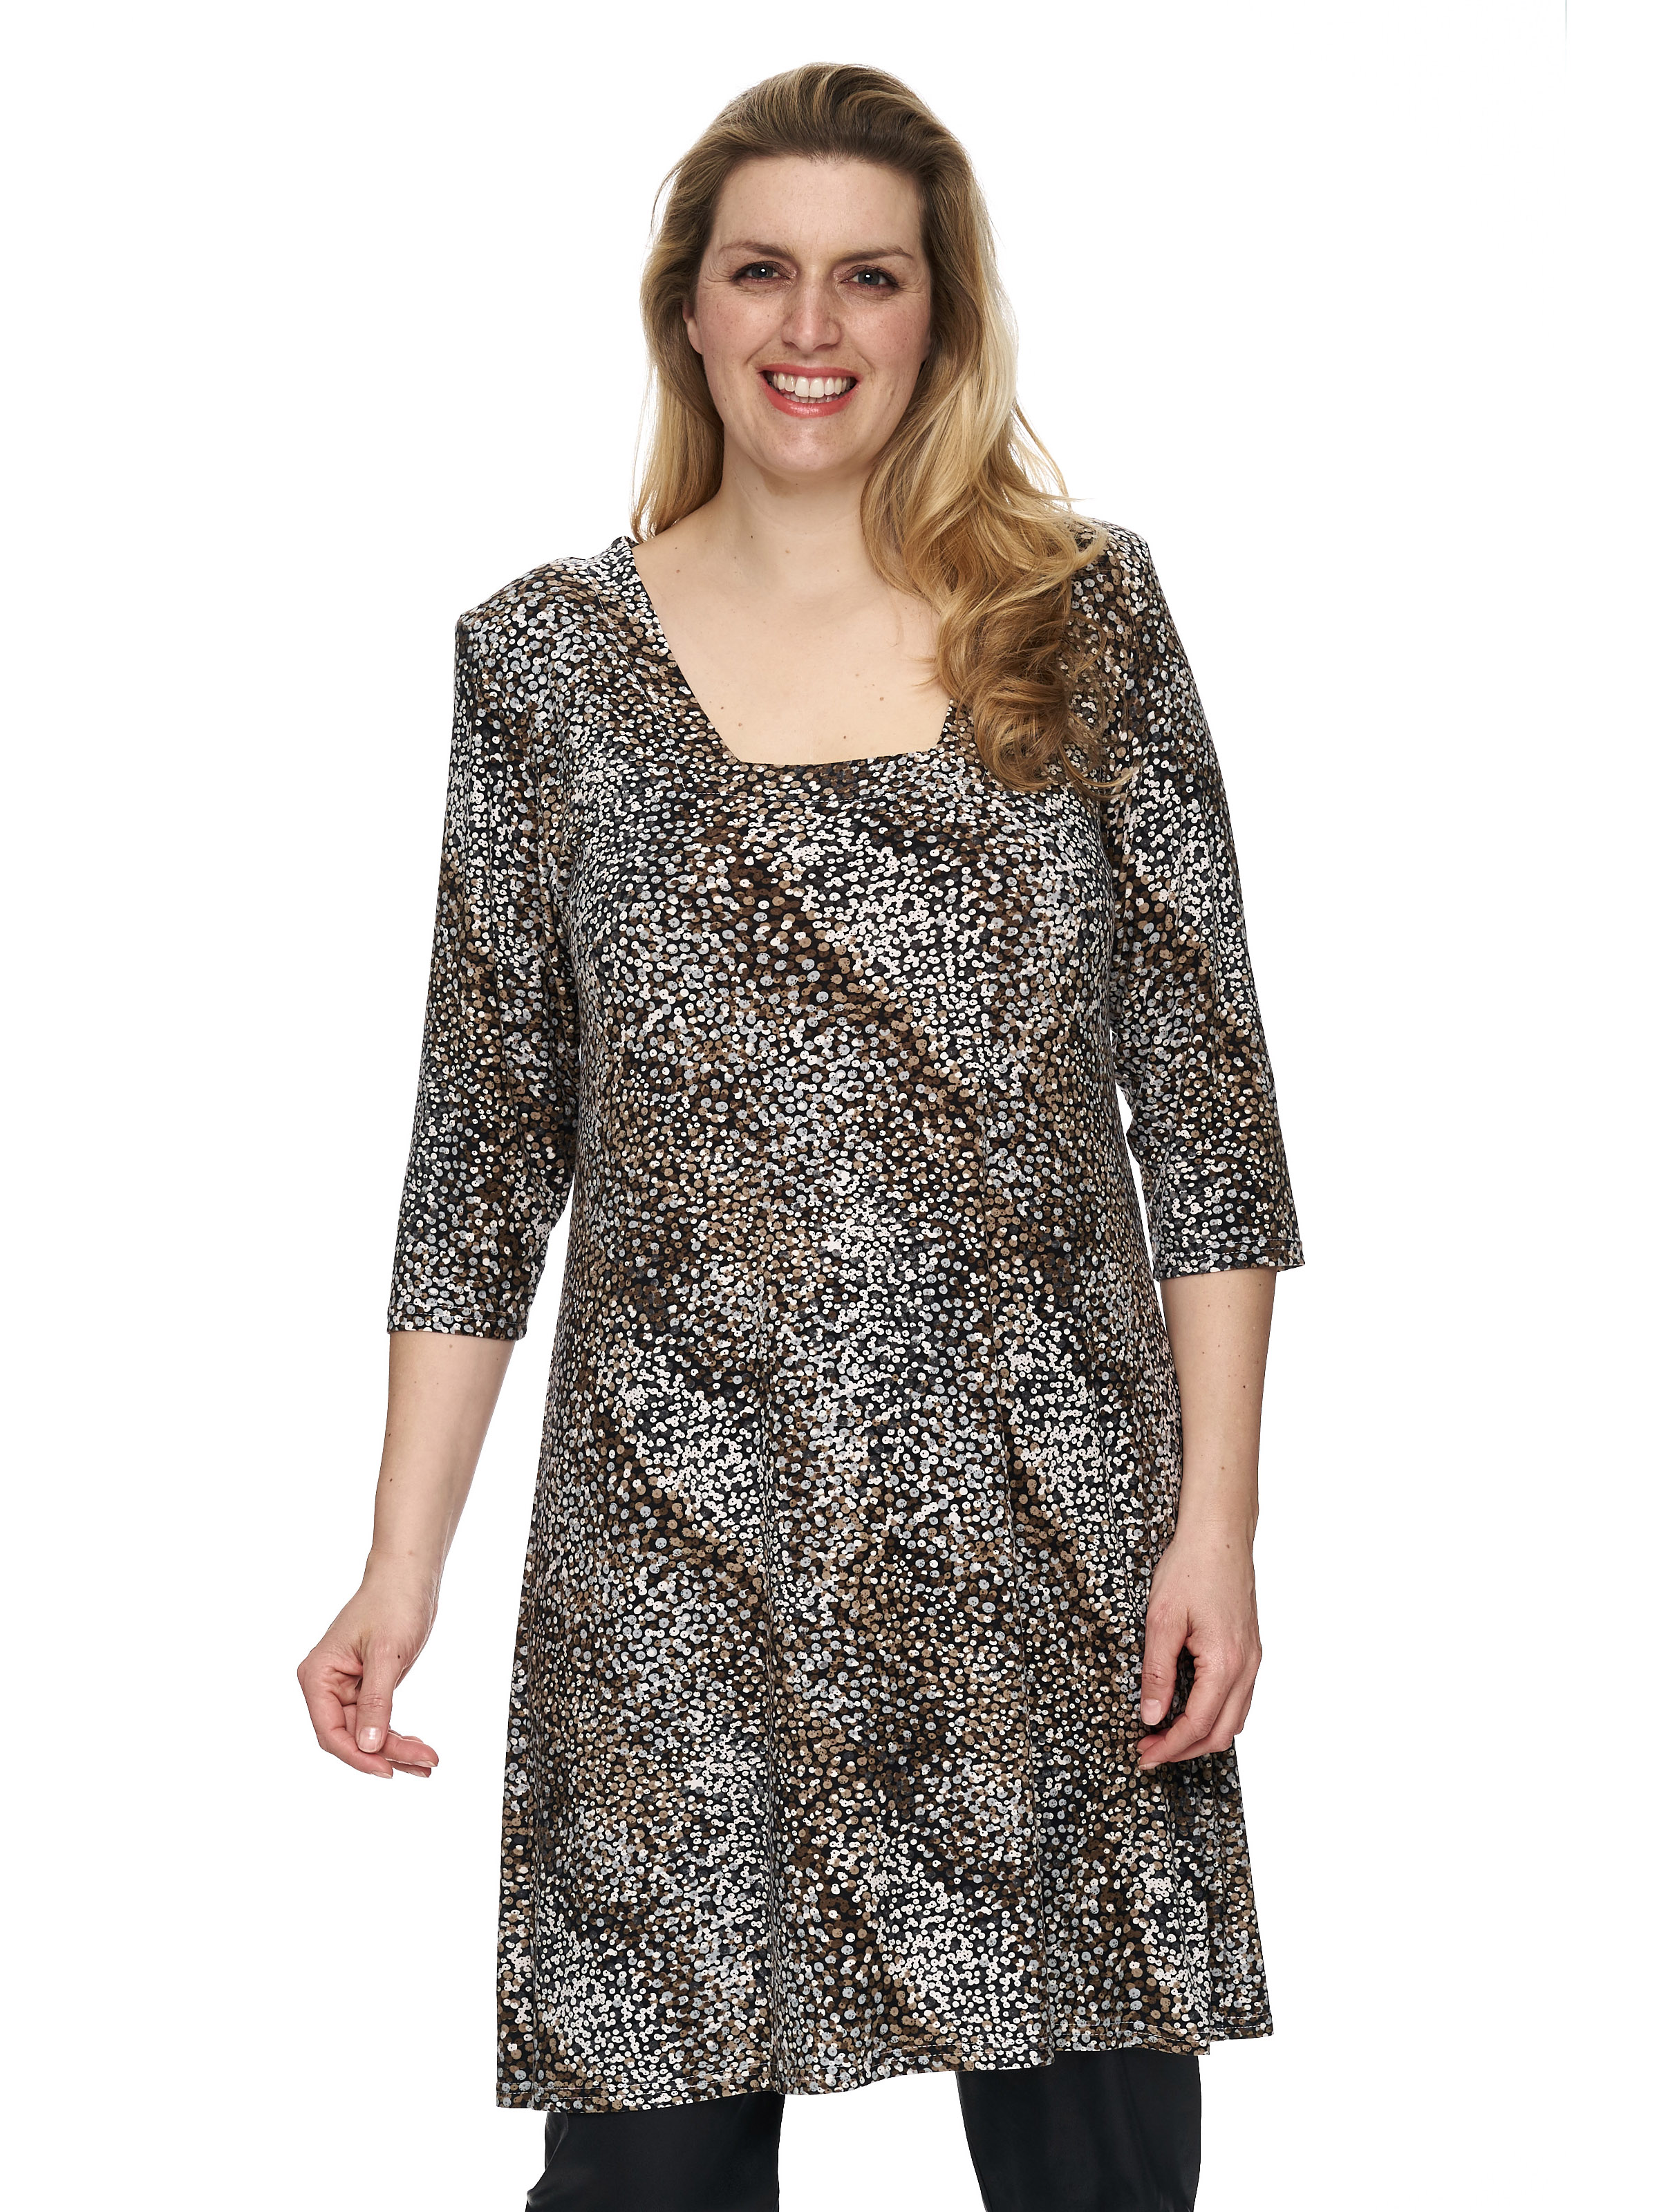 Magna Damen Tunika Kleid A-Linie Casual Paillettenprint 16 16 16